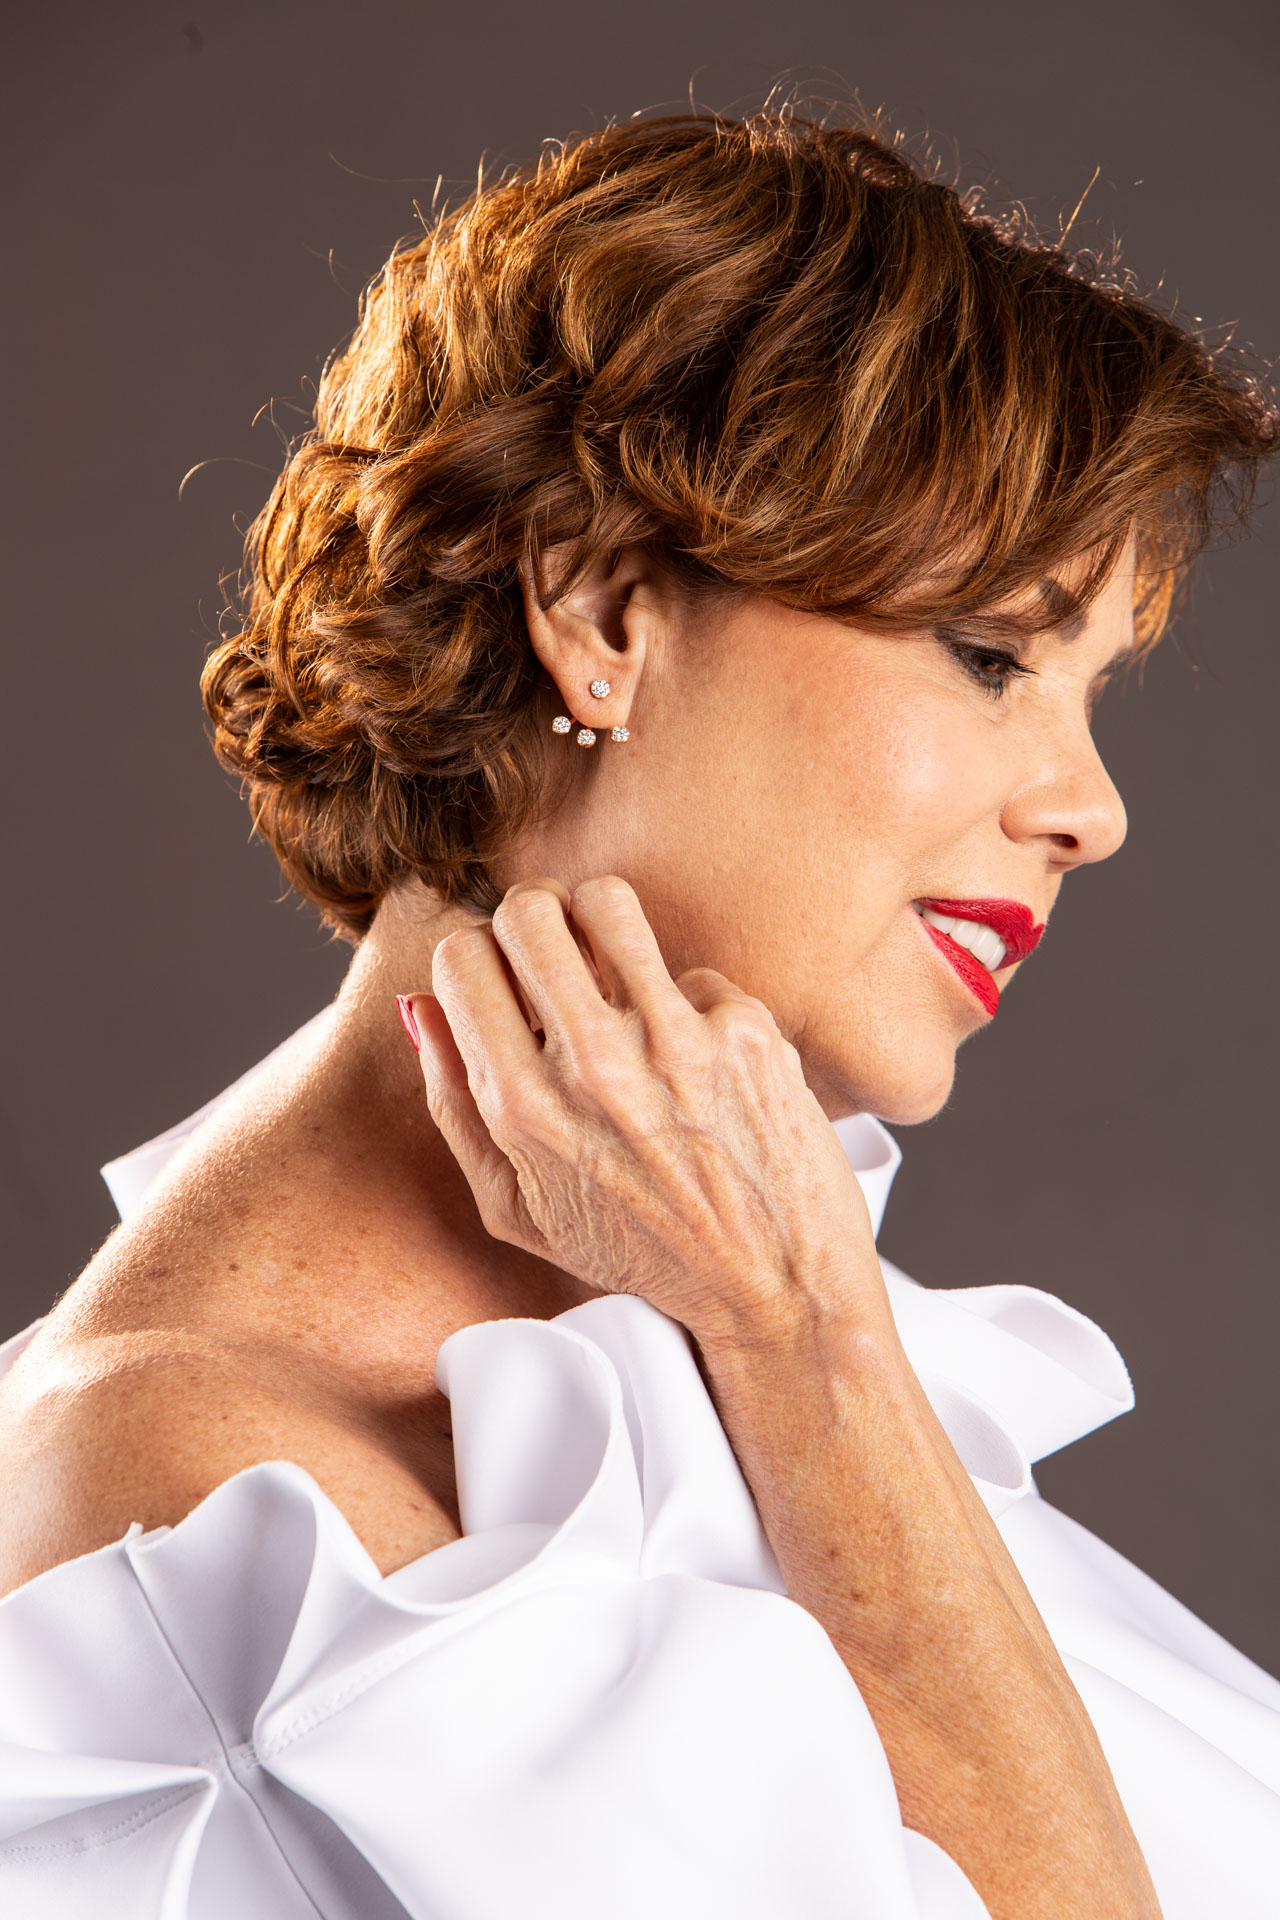 chuky-reyna-mi-camisa-blanca-wearing-eravos-earrings